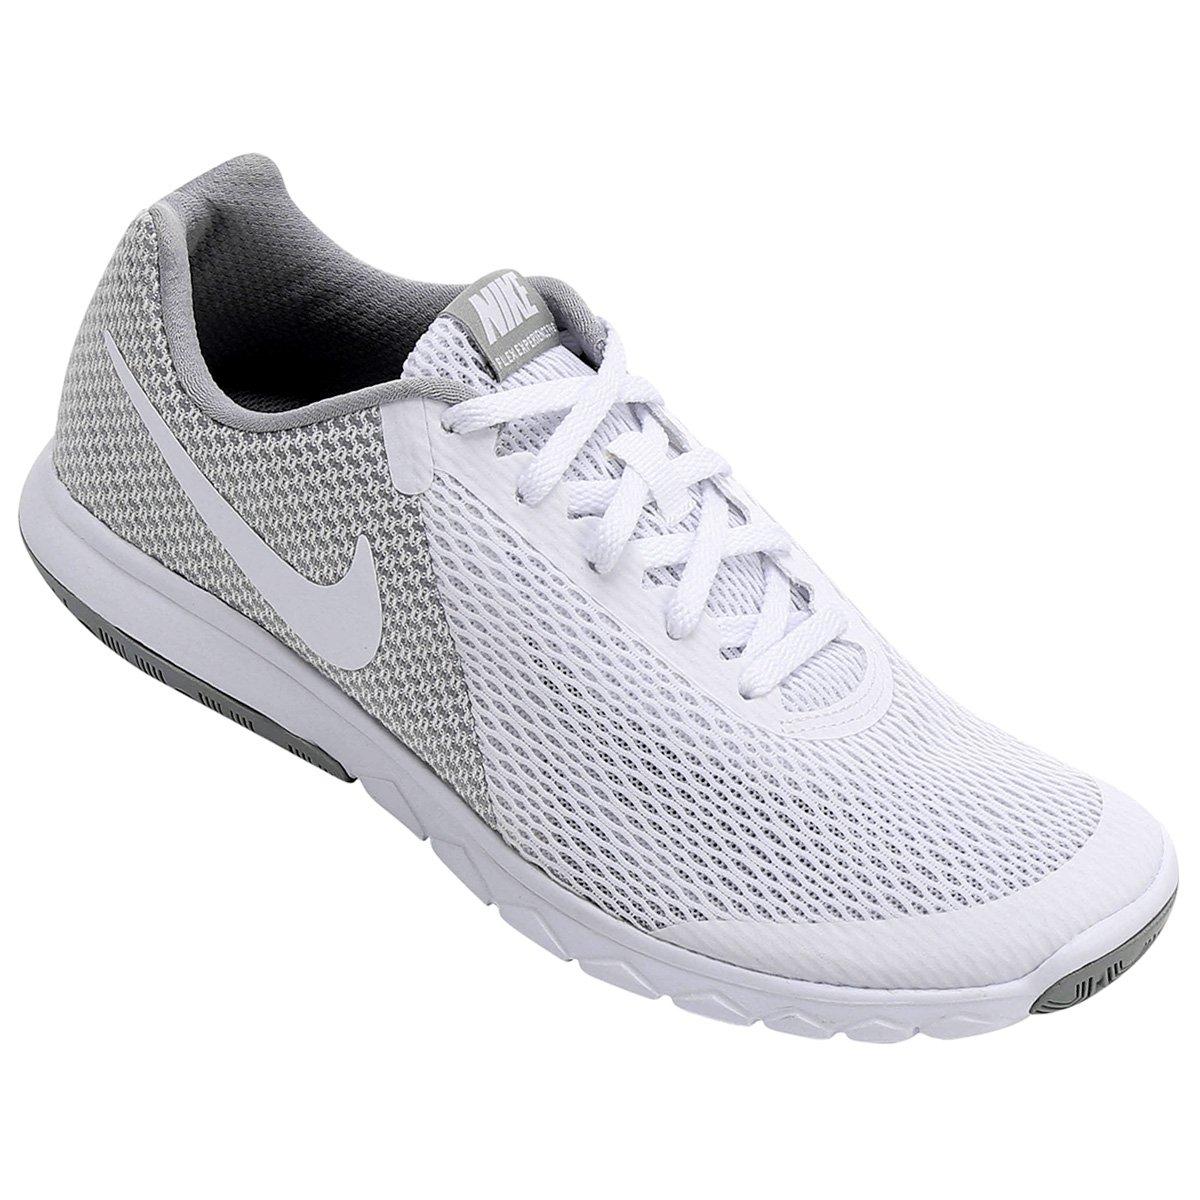 2f3850a5357 Tênis Nike Flex Experience Rn 6 Feminino - Branco e Cinza - Compre Agora